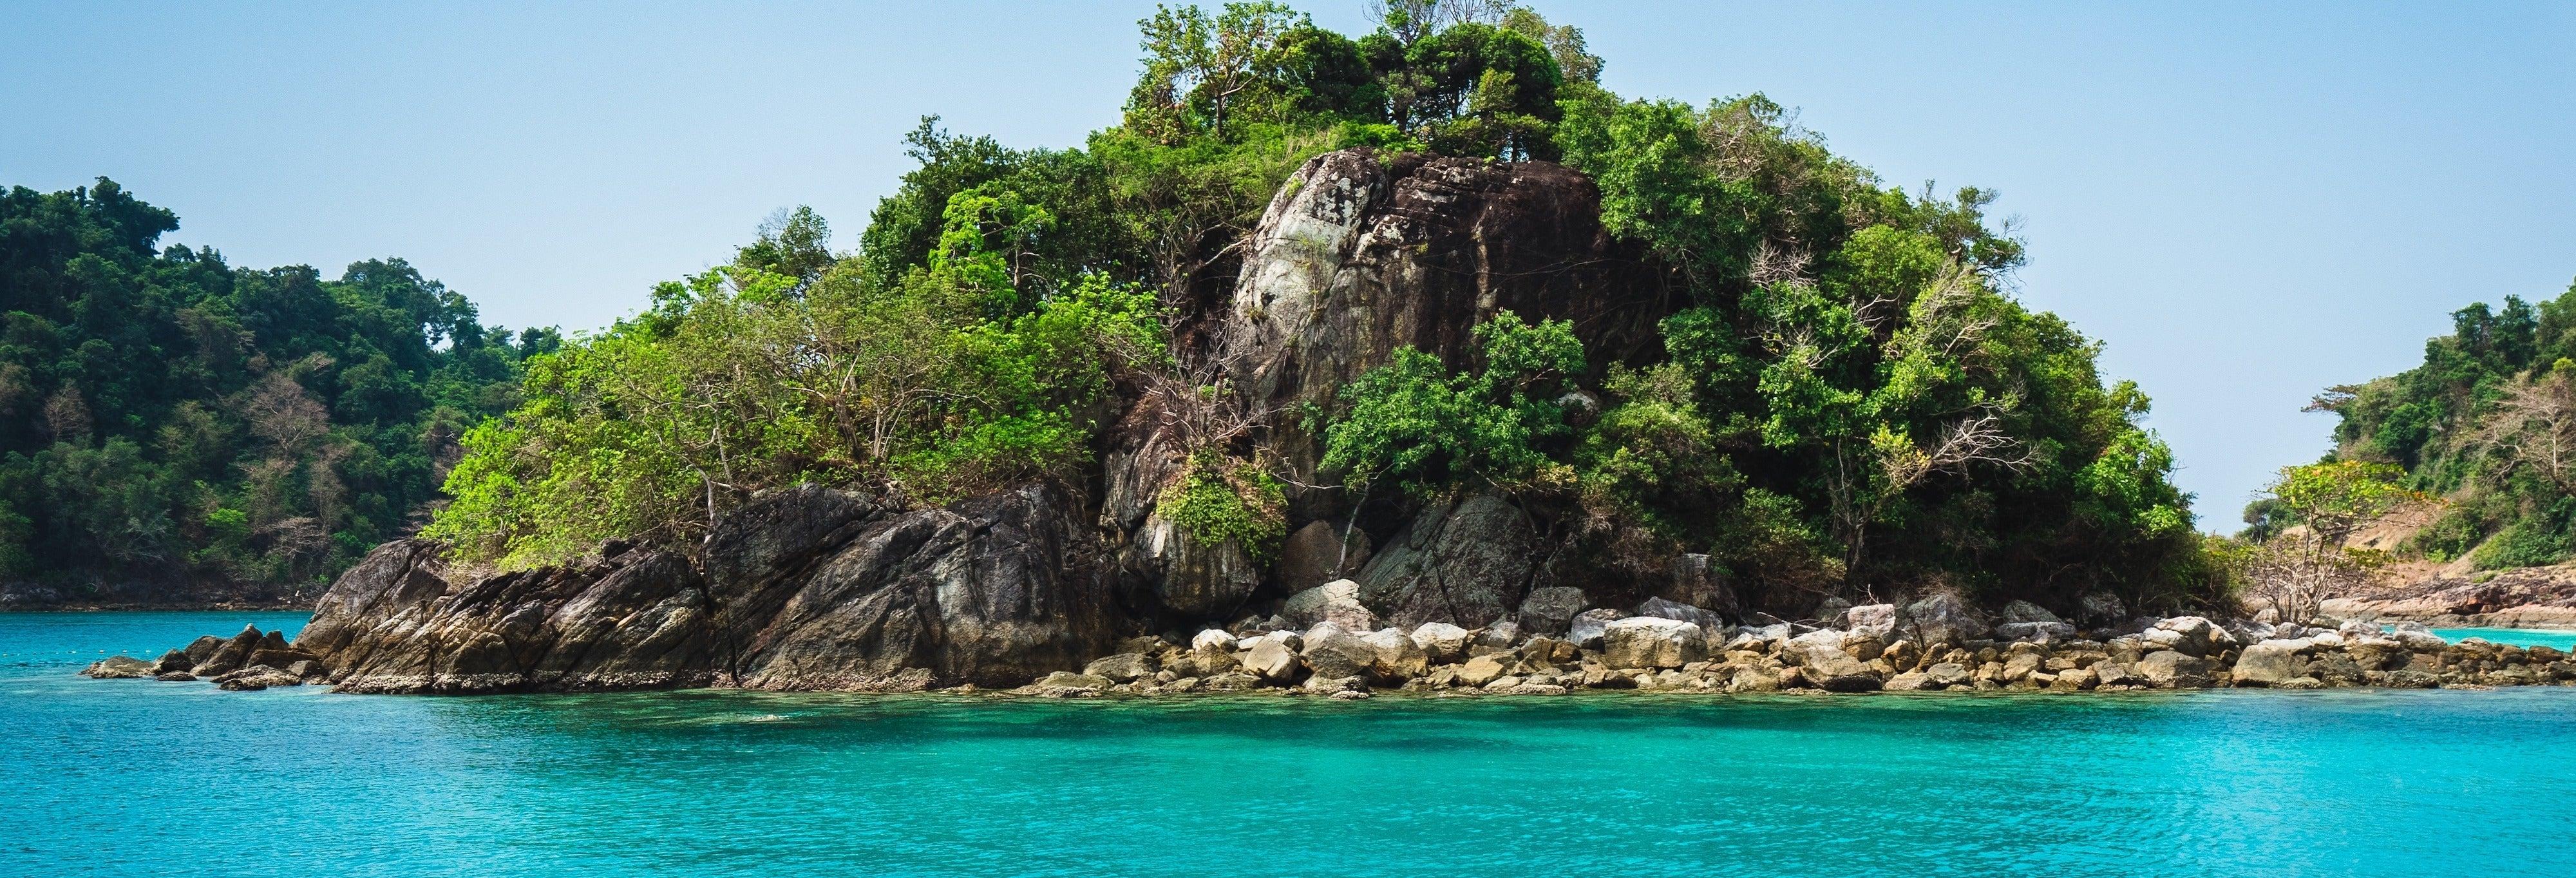 Snorkel em Koh Rang